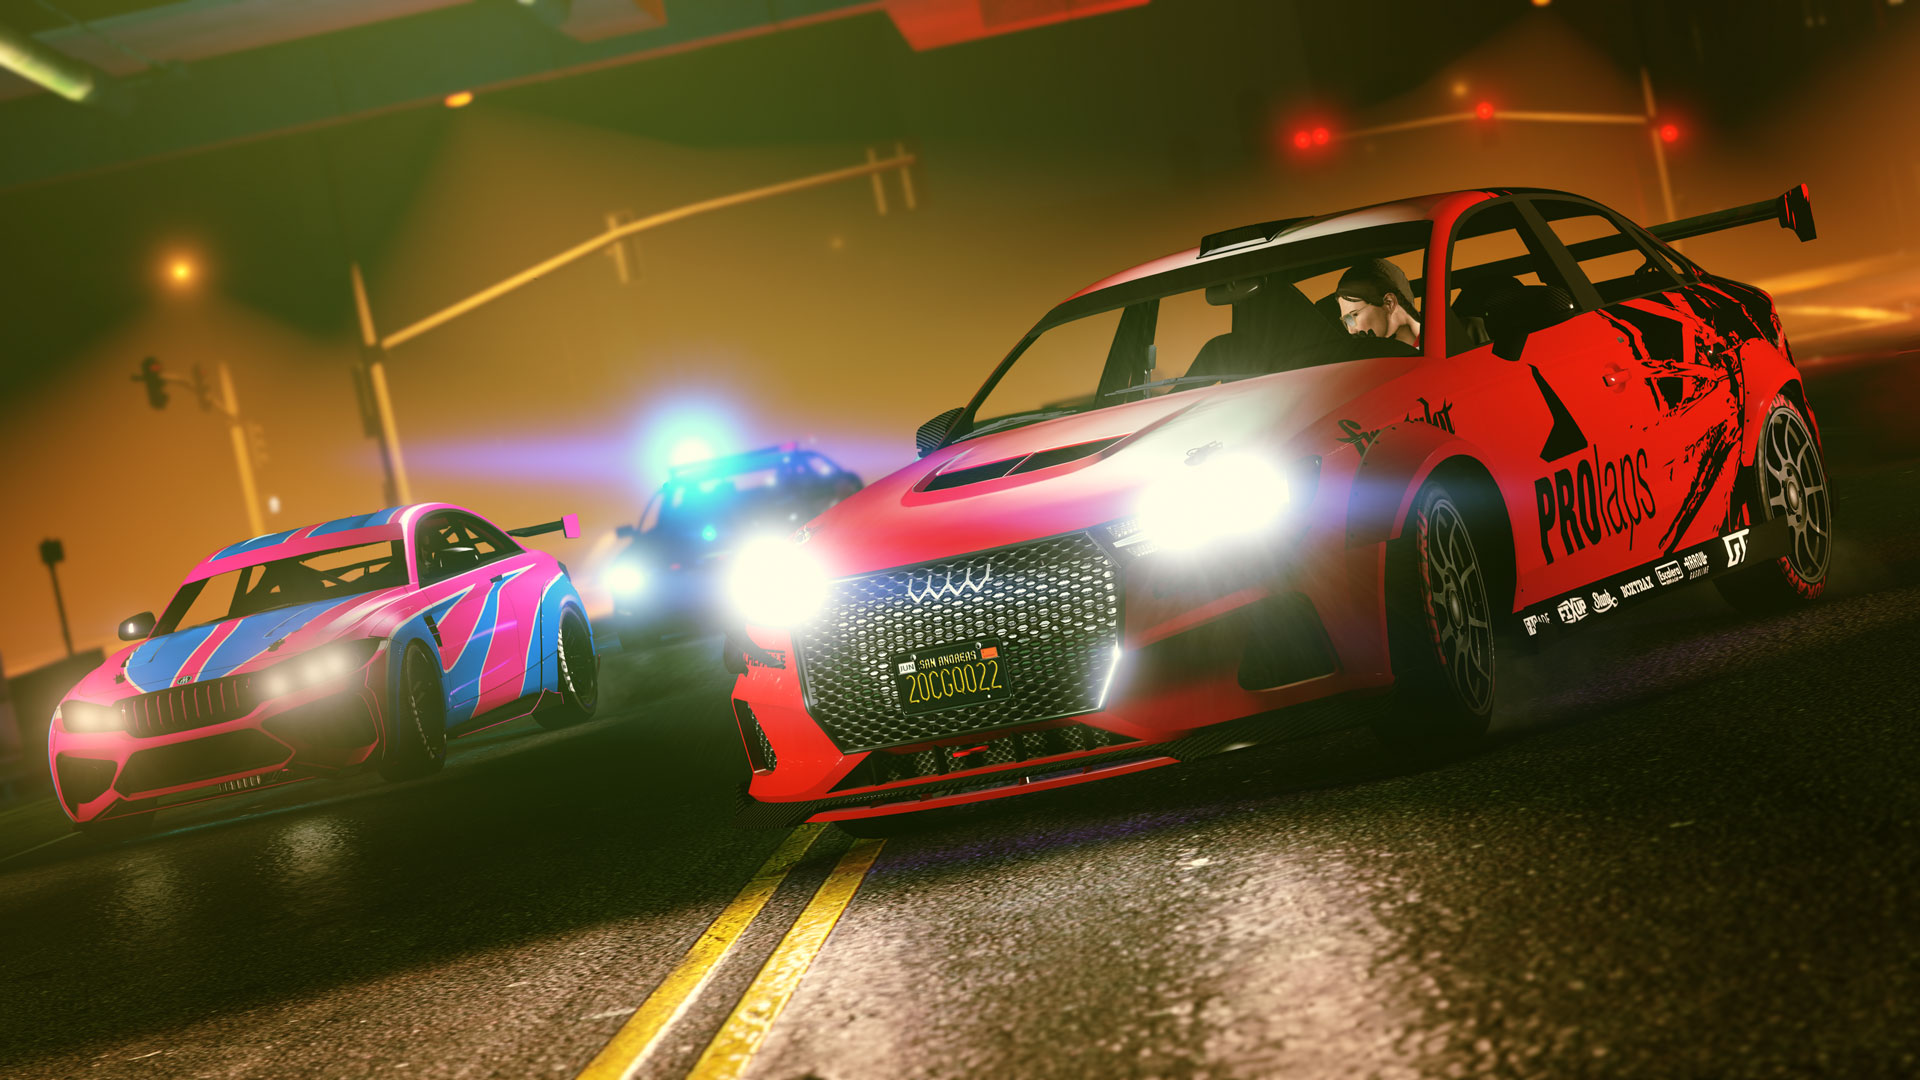 GTA 5 Online: Los Santos Tuners Update Starts Today - Return of Car Culture